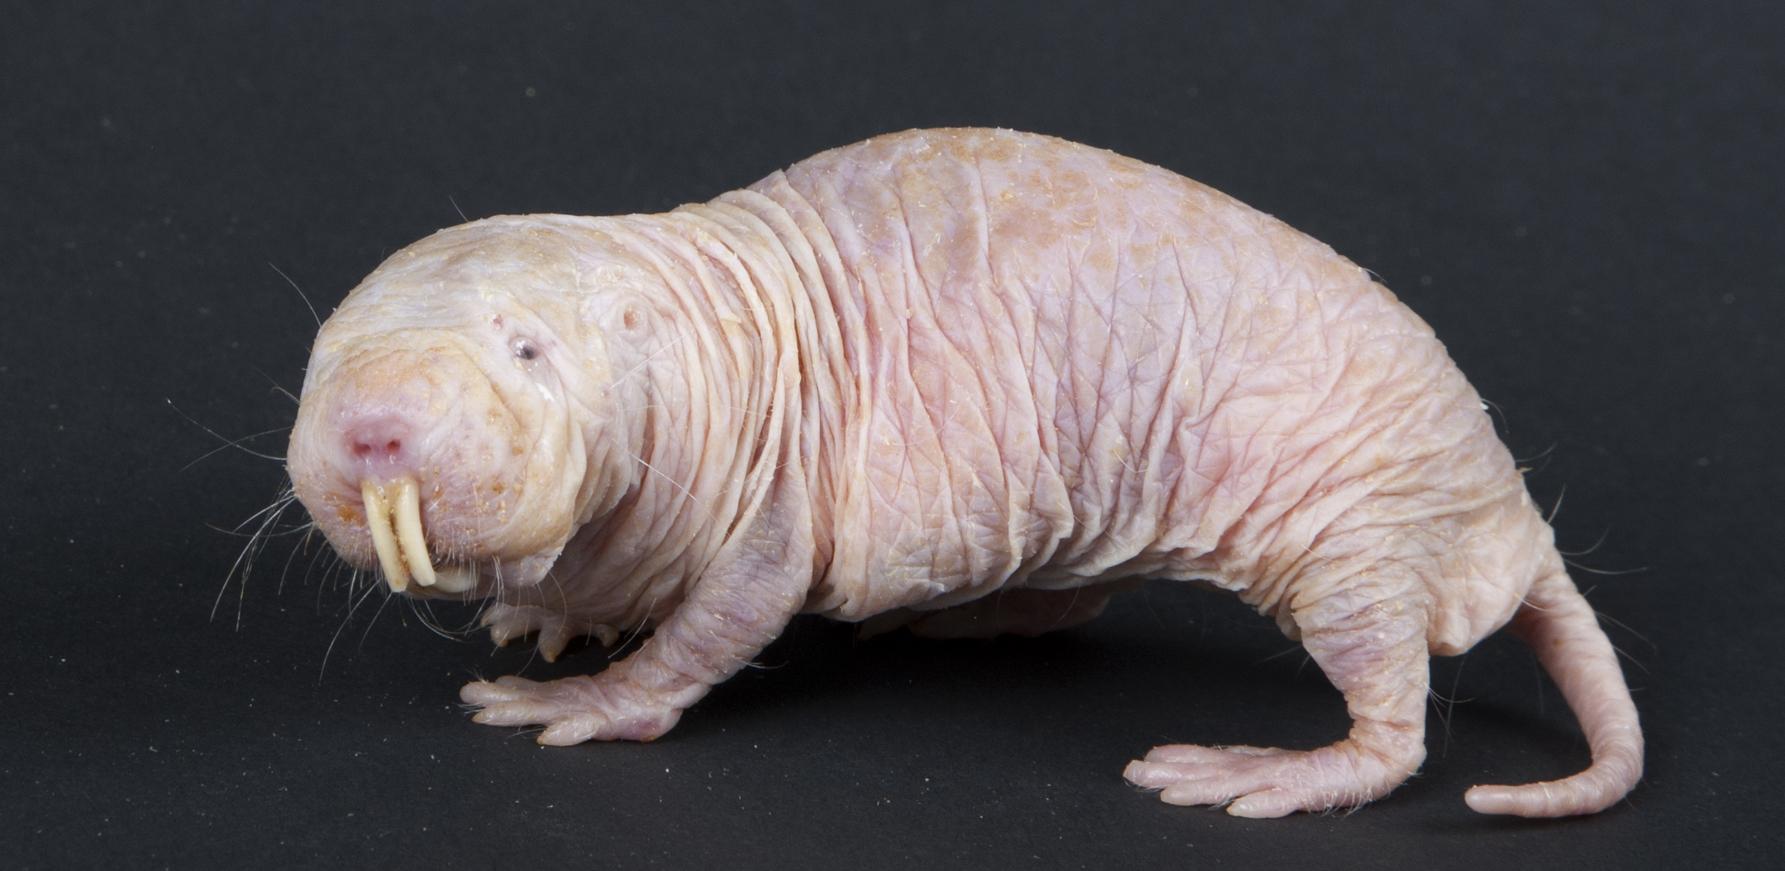 The intestinal biology of naked mole rats